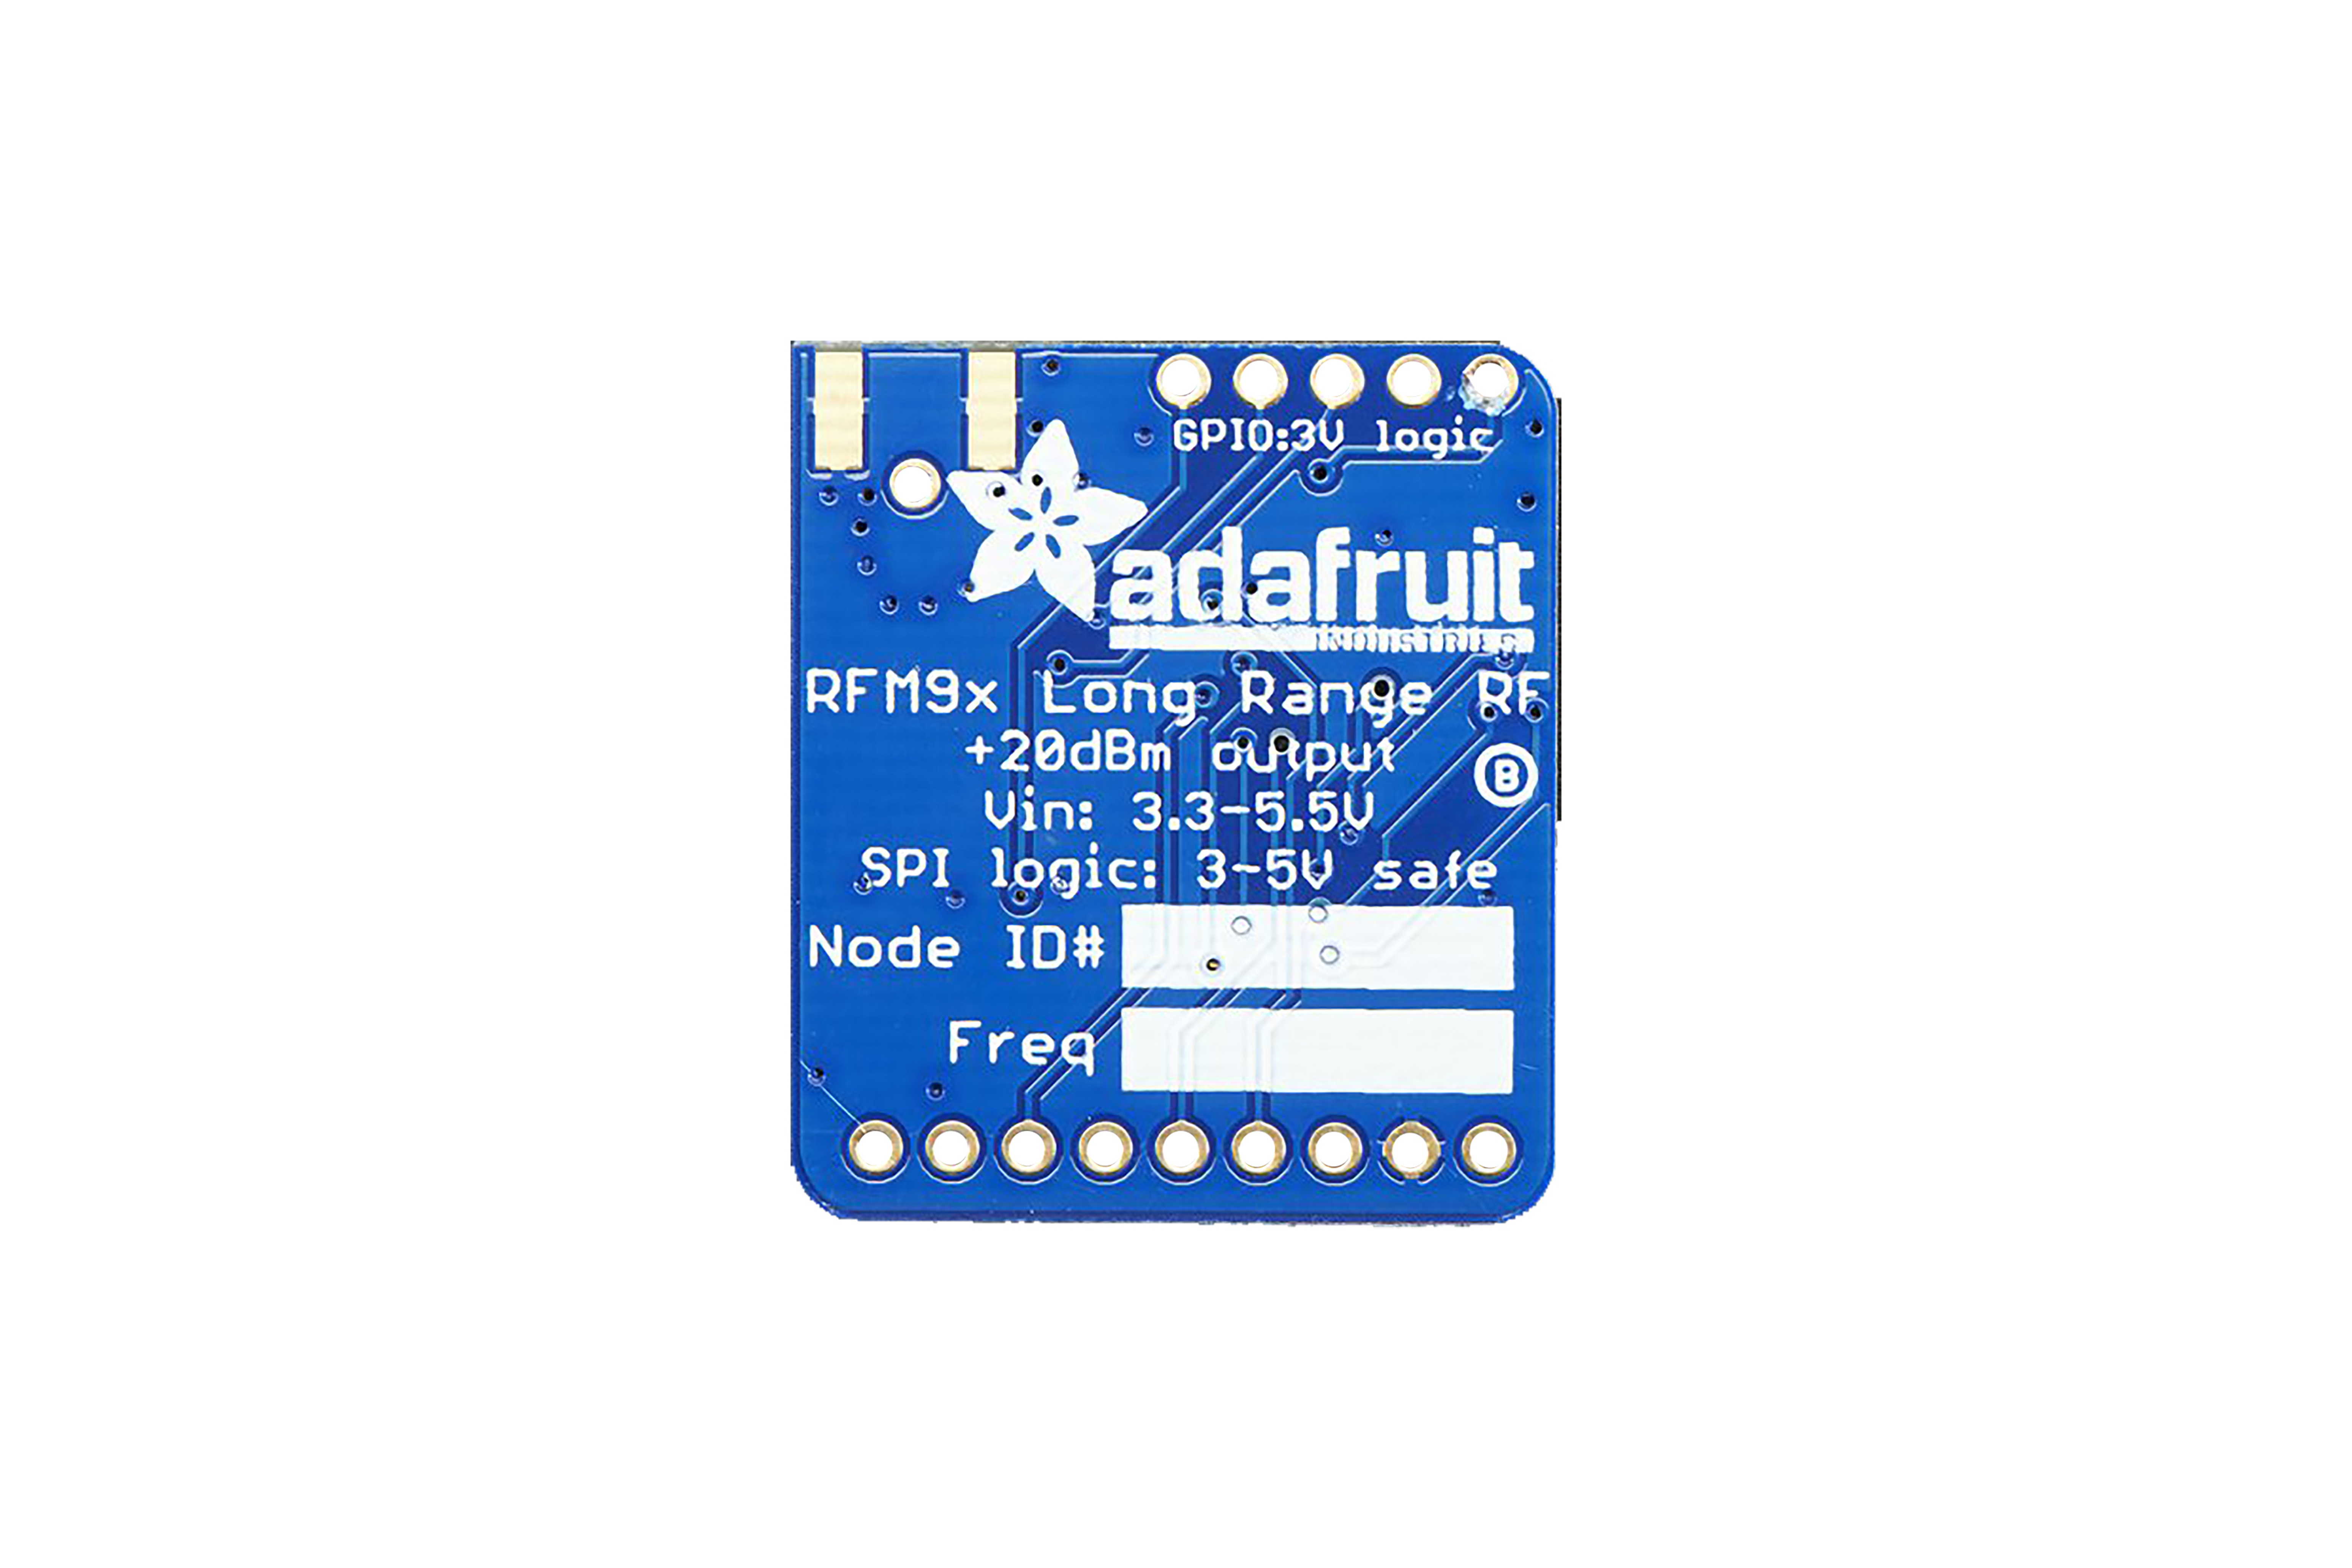 Adafruit(アダフルーツ) LoRa(ローラ)トランシーバボード 433 MHz